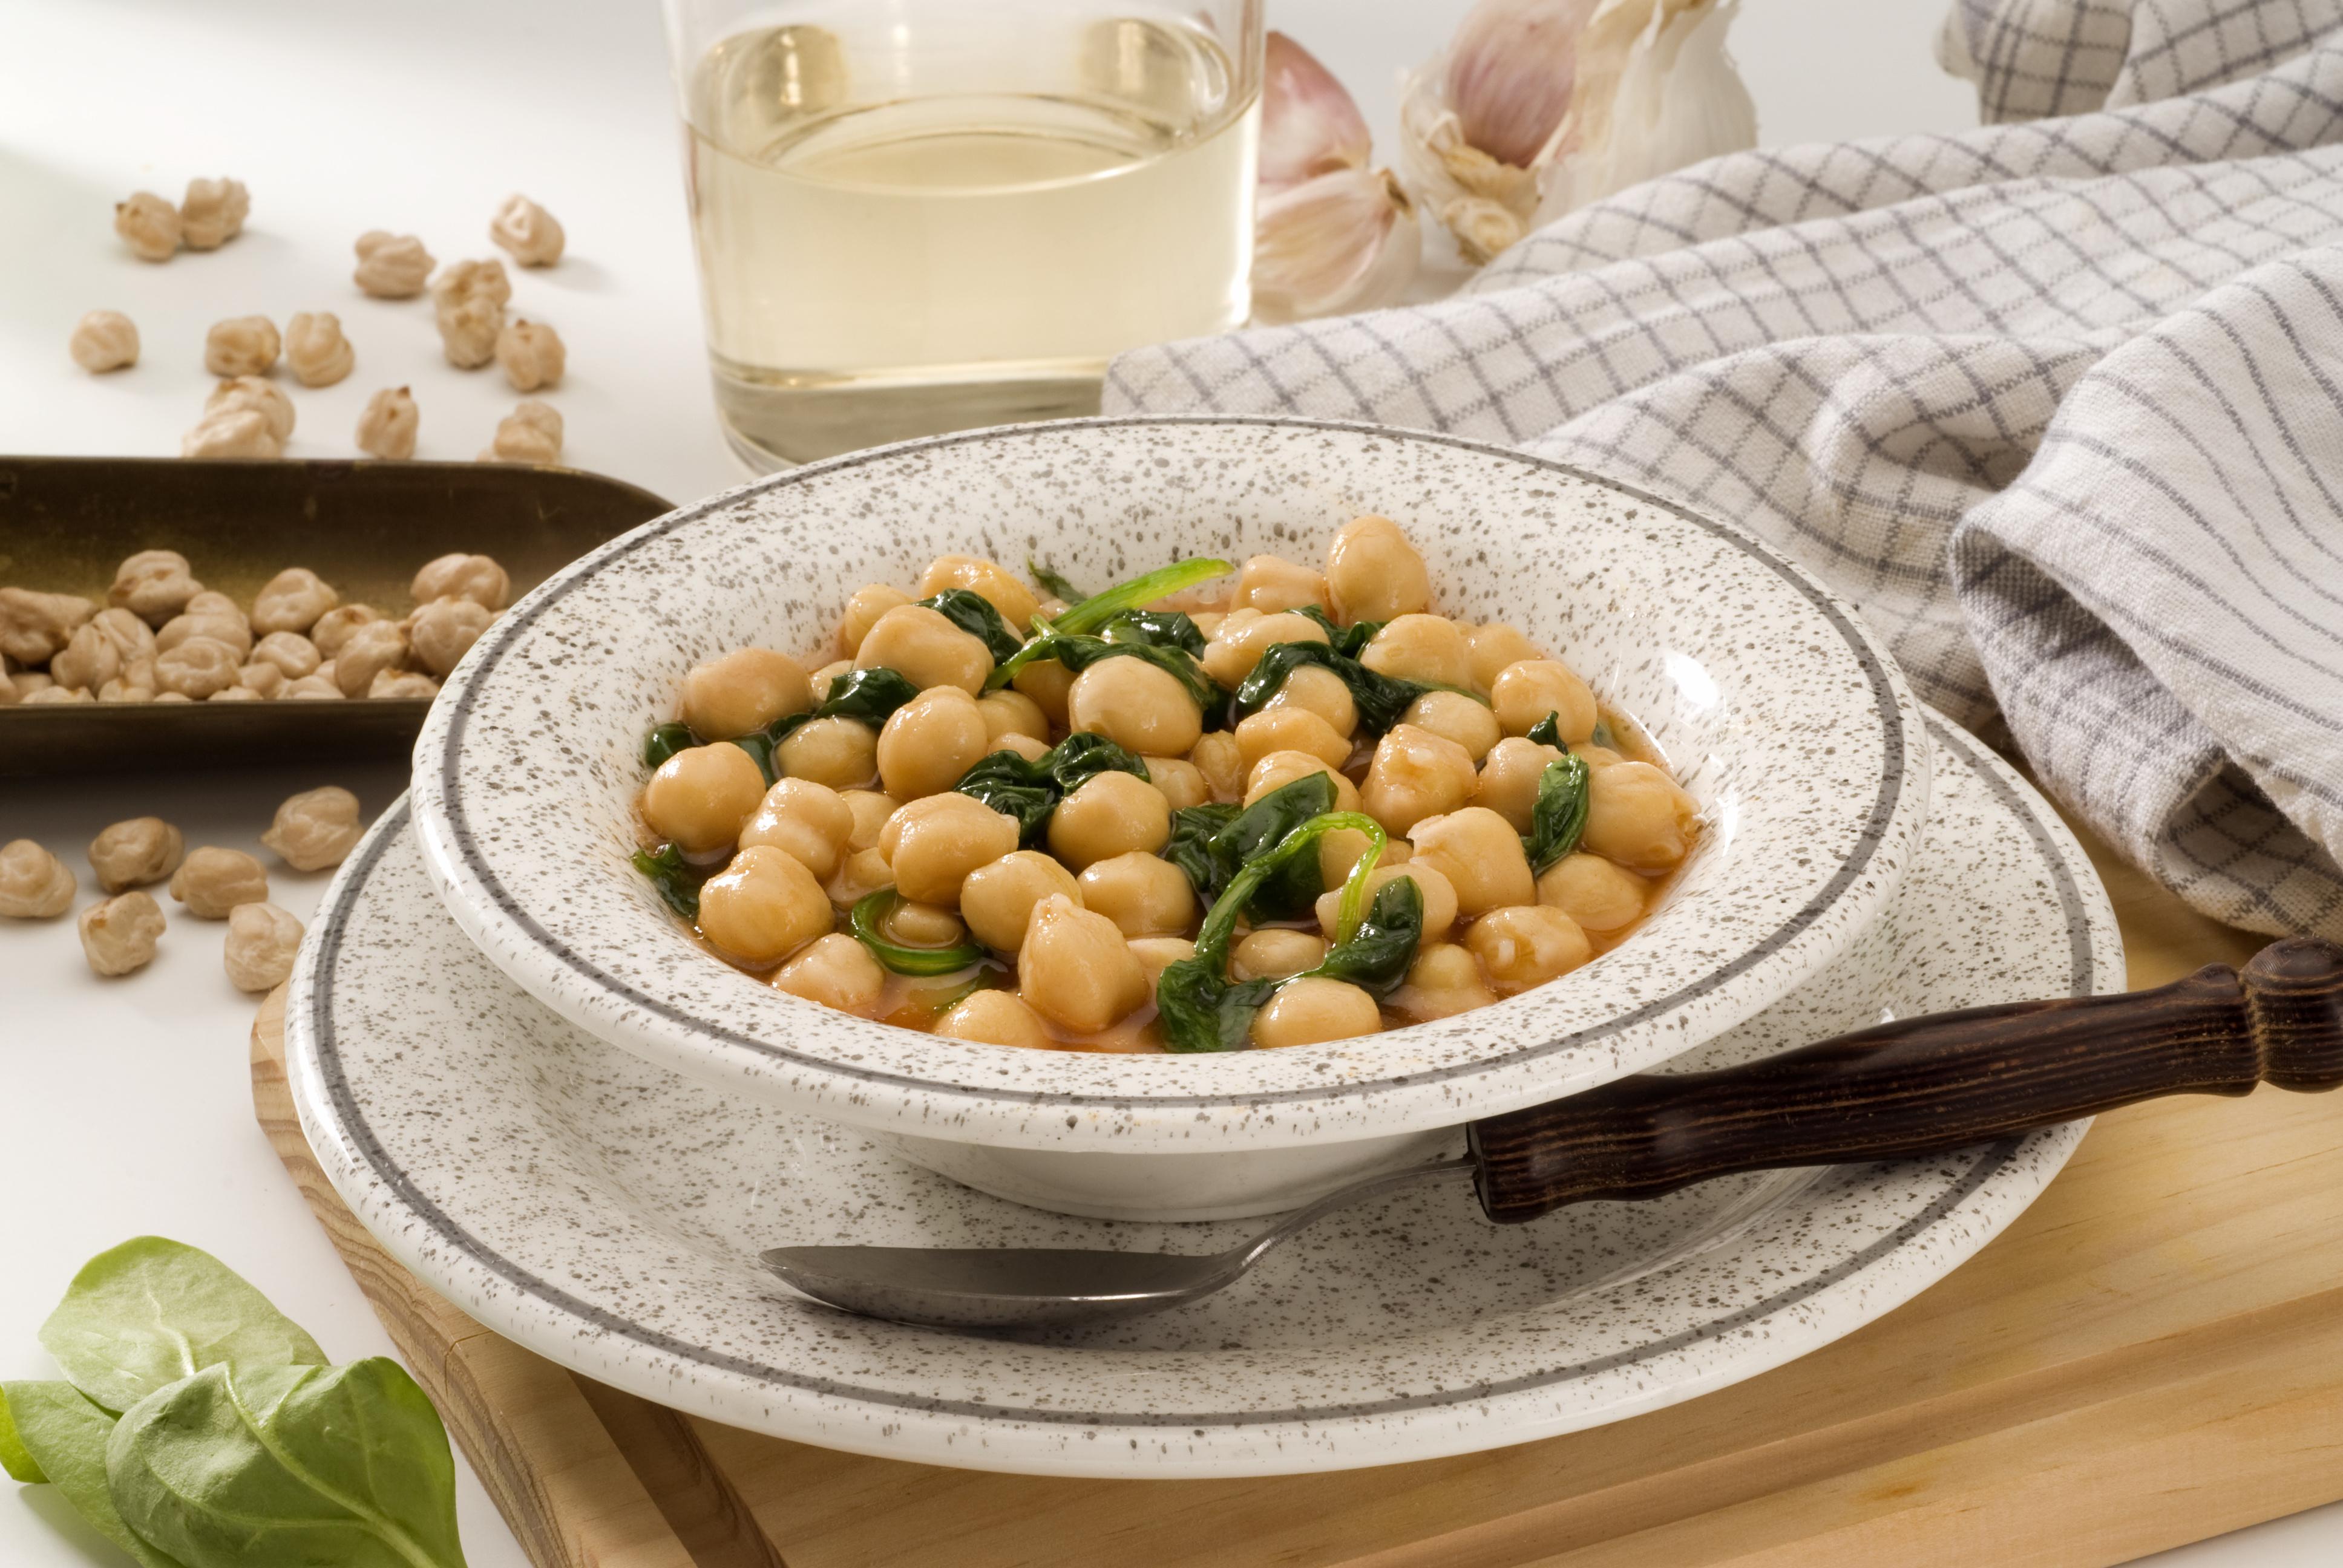 dieta depurativa vegana hipocalórica